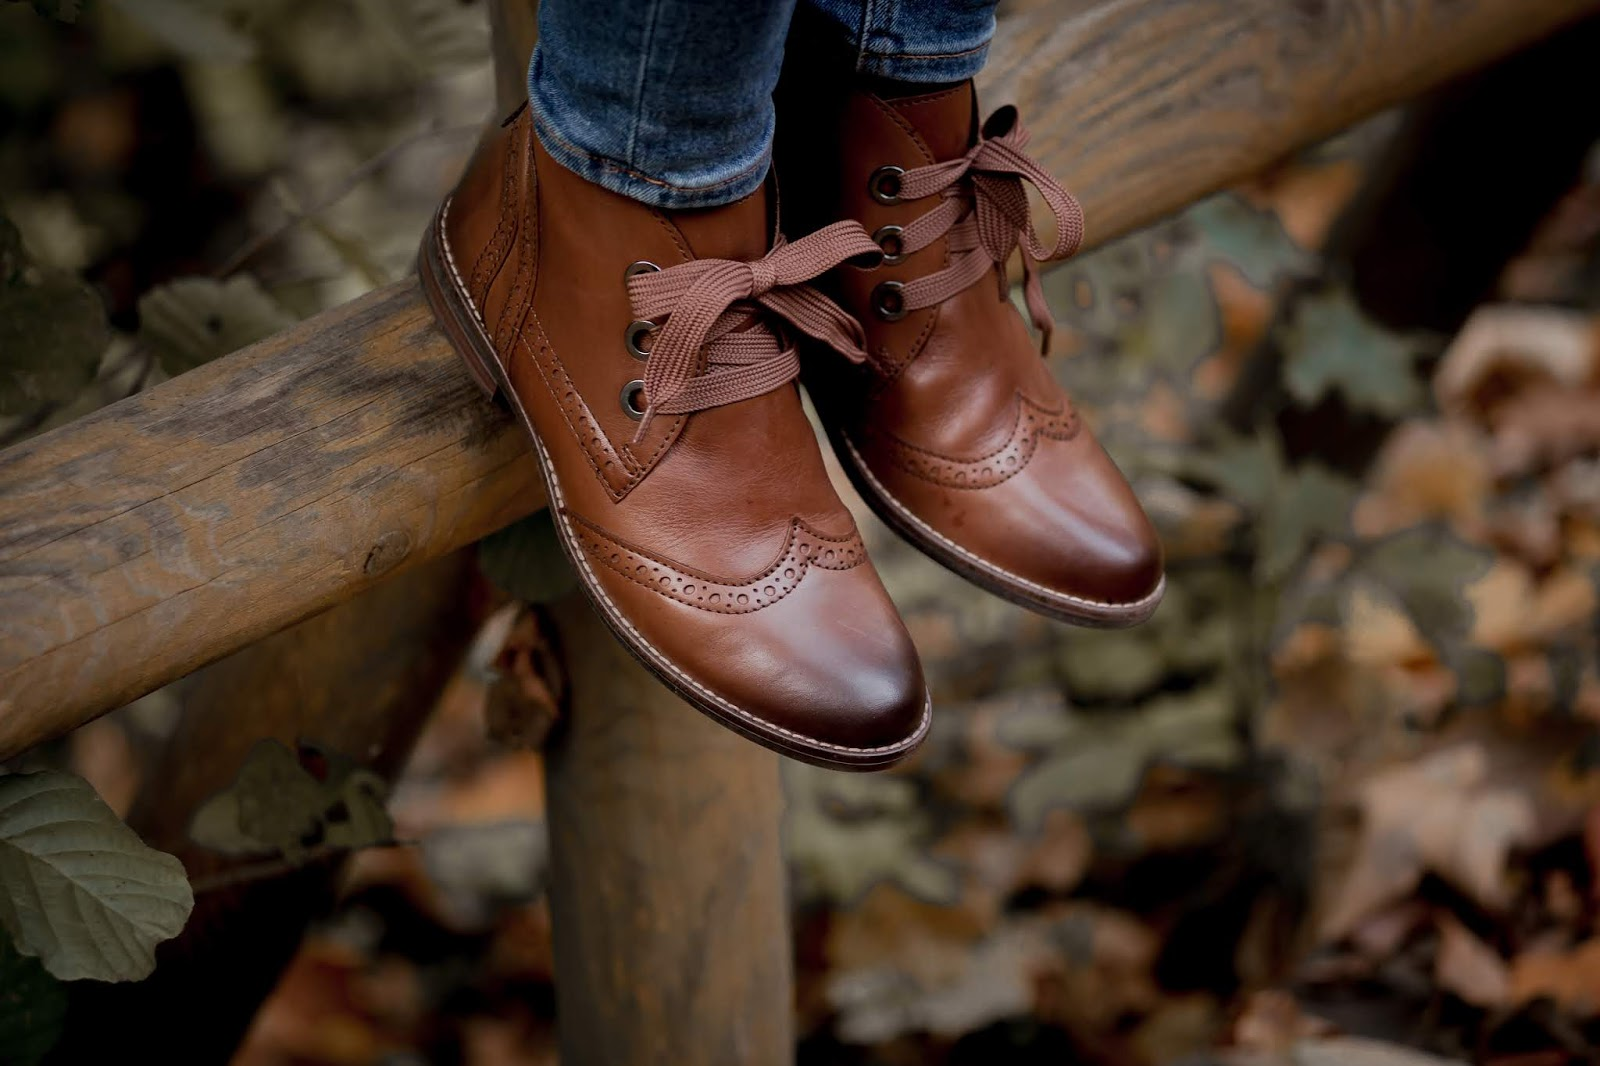 buty skórzane, skórka